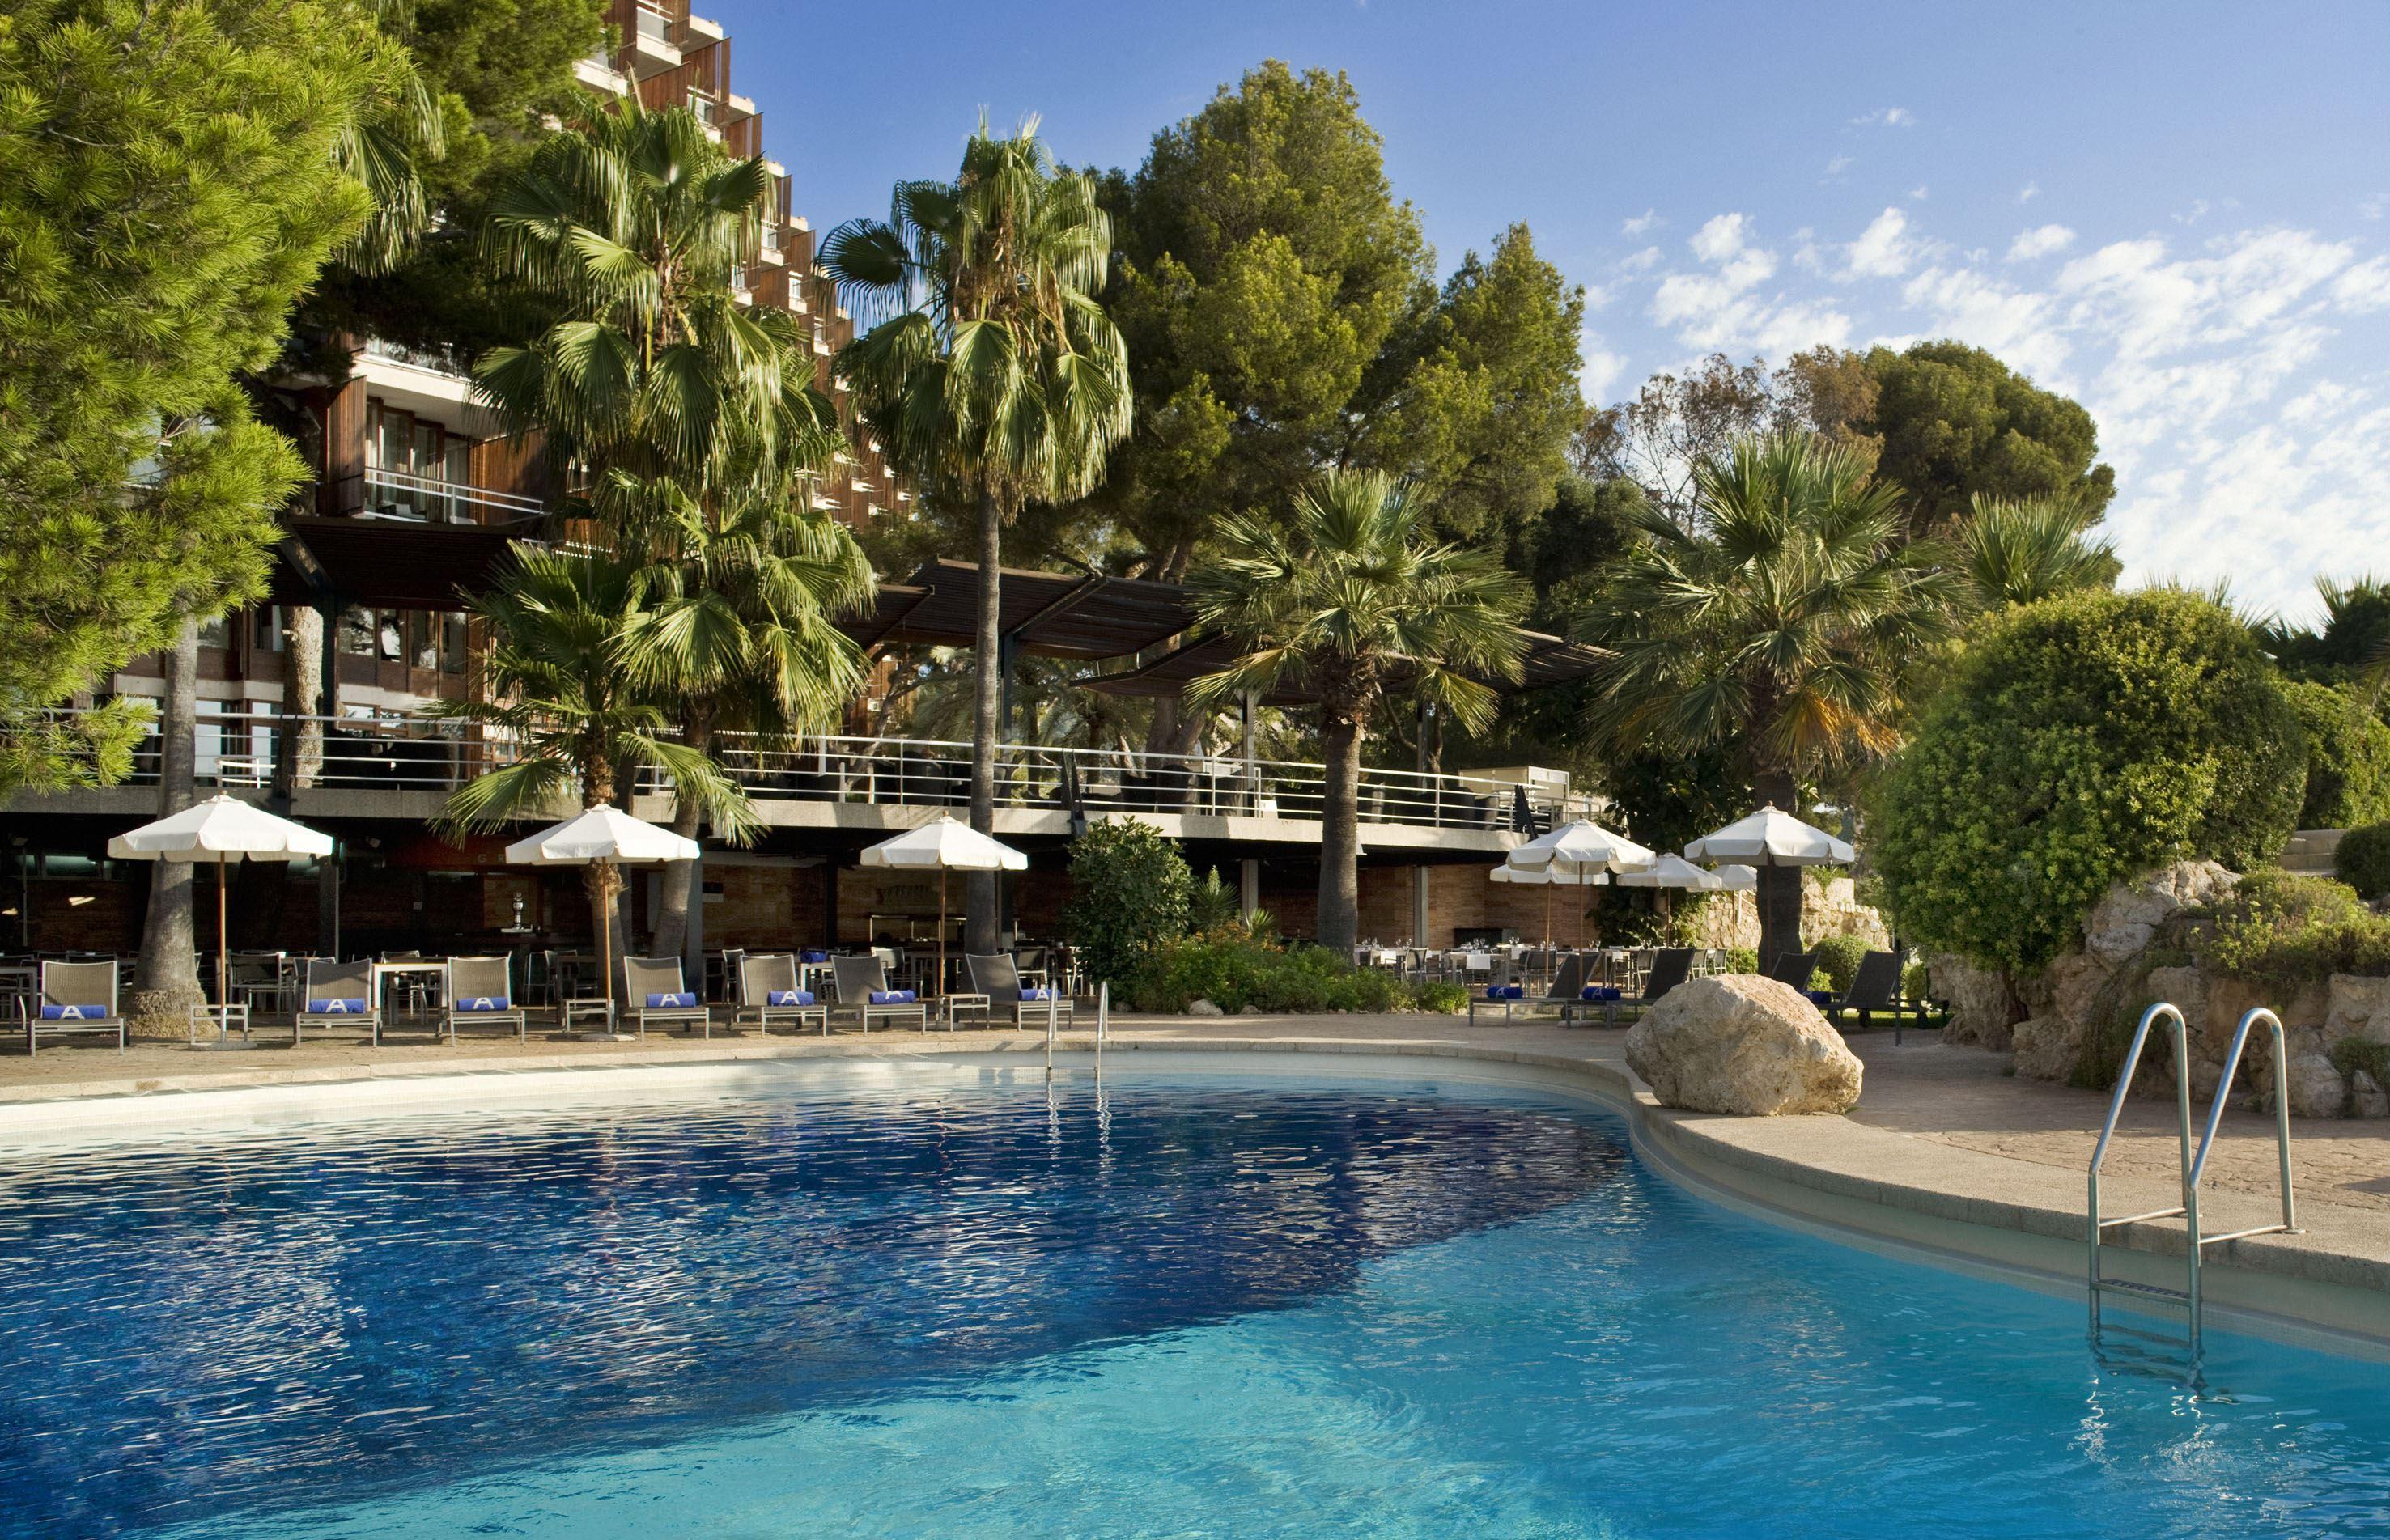 Pool på Hotell Gran Melia de Mar, Illetas Mallorca